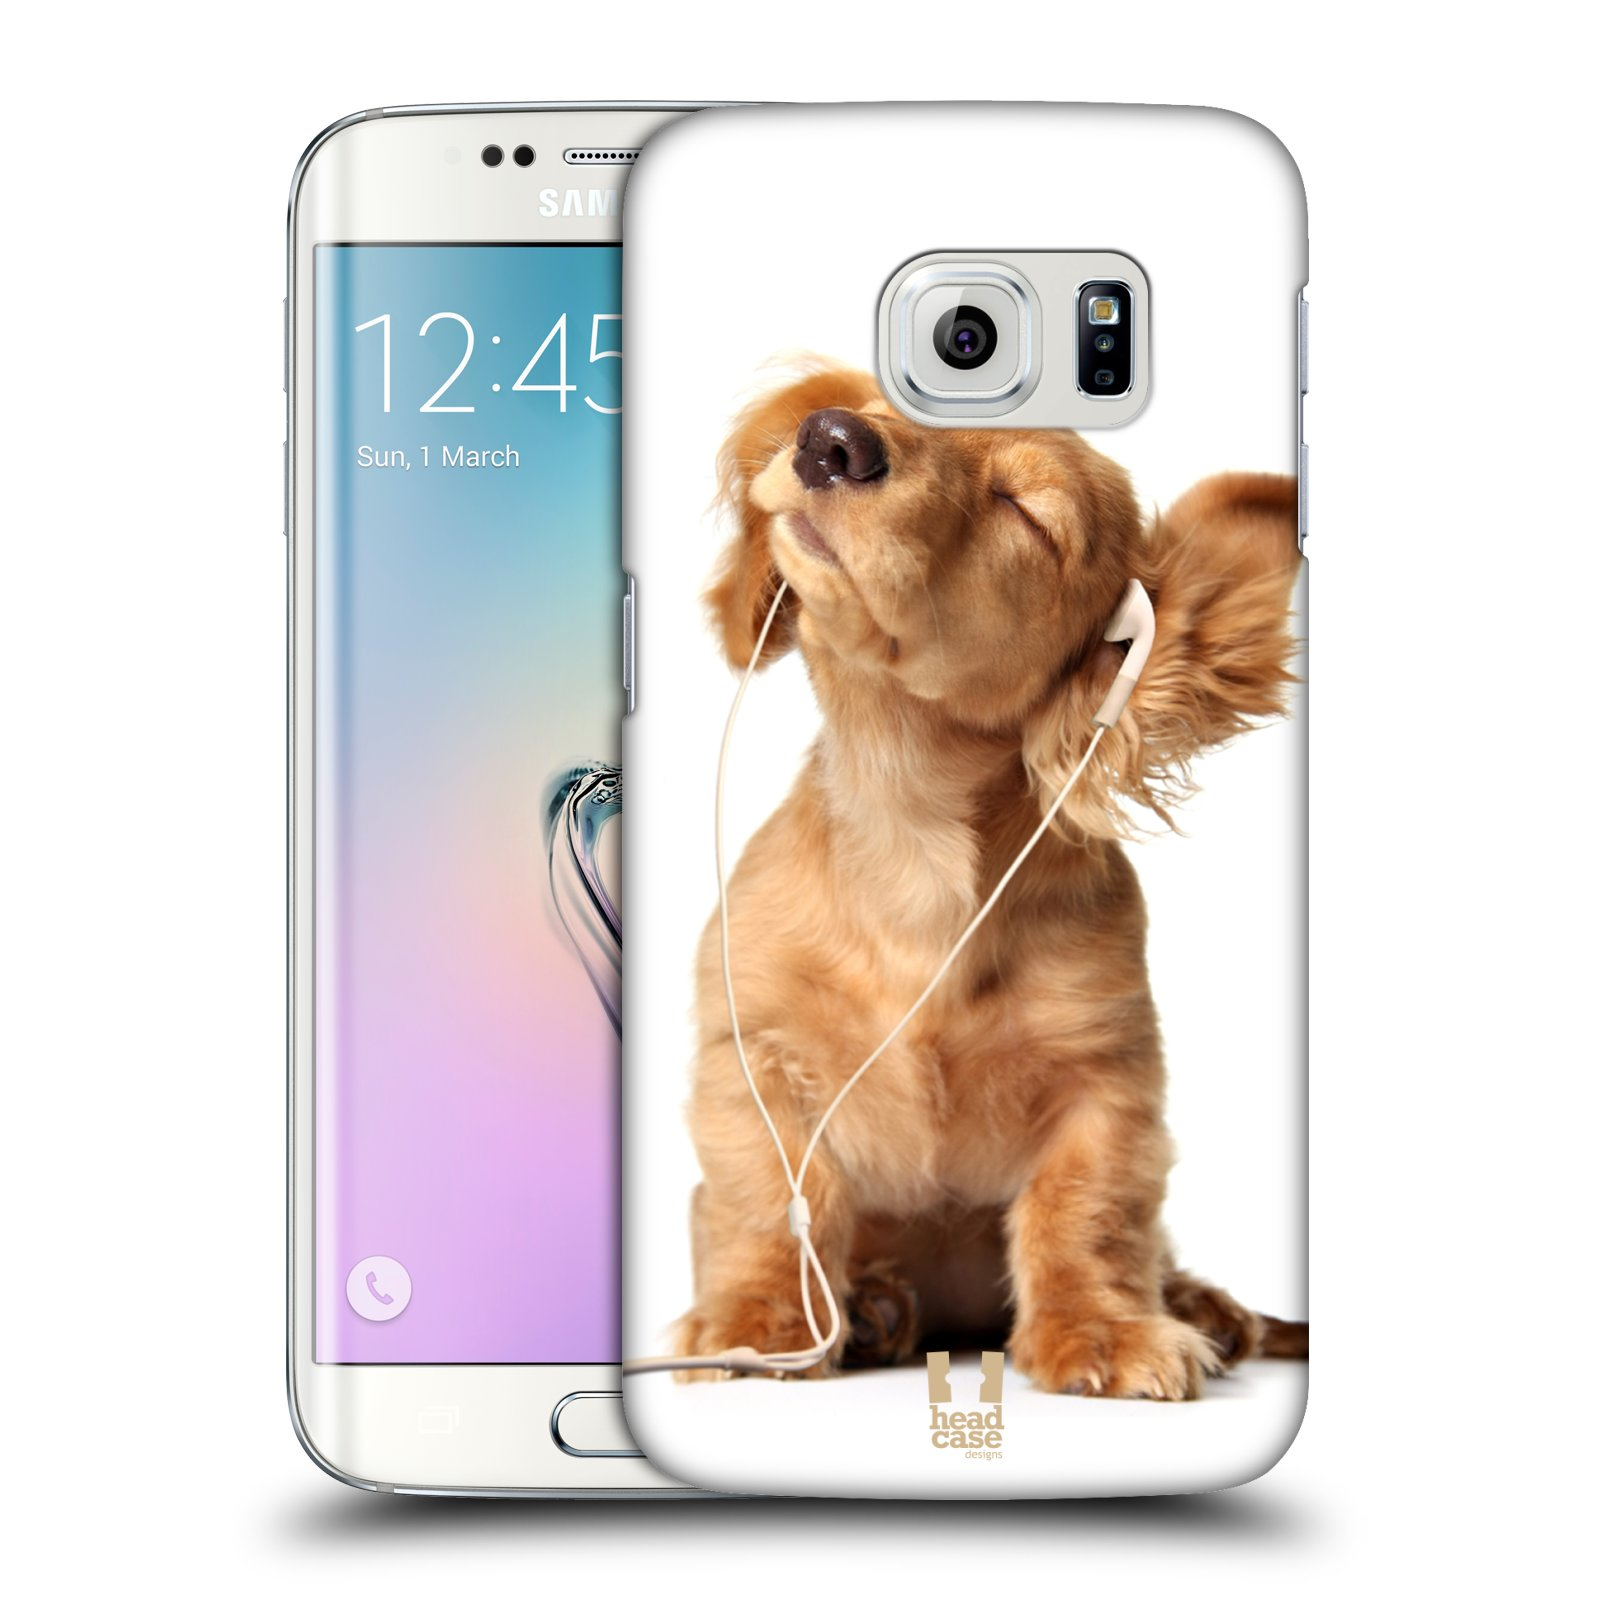 HEAD CASE plastový obal na mobil SAMSUNG Galaxy S6 EDGE (G9250, G925, G925F) vzor Legrační zvířátka roztomilé štěňátko se sluchátky MUSIC